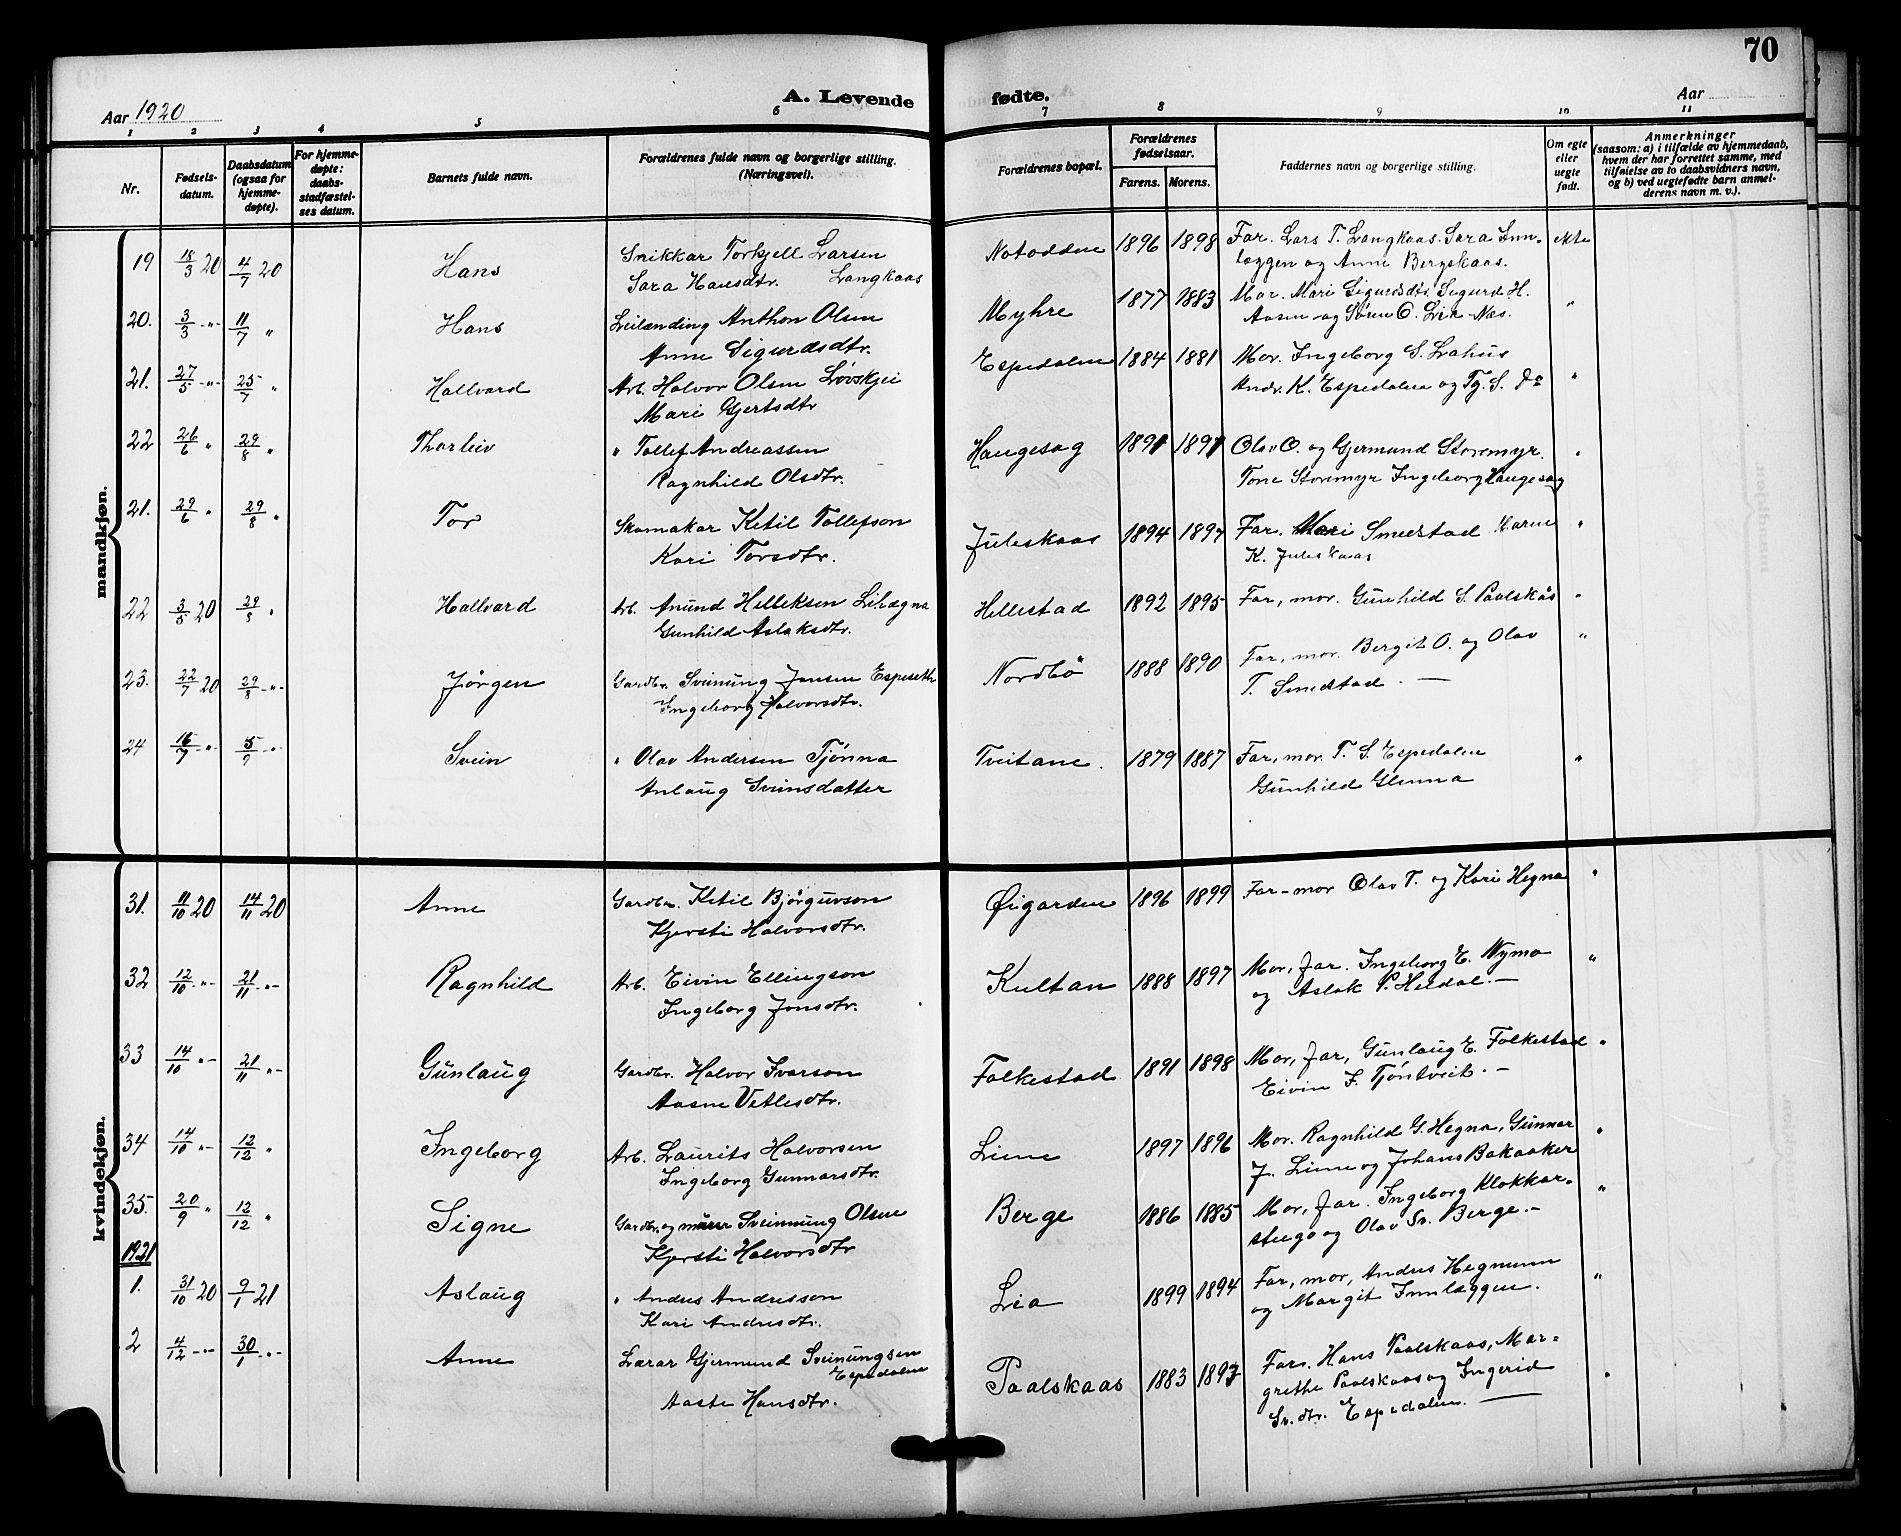 SAKO, Bø kirkebøker, G/Ga/L0007: Klokkerbok nr. 7, 1909-1924, s. 70